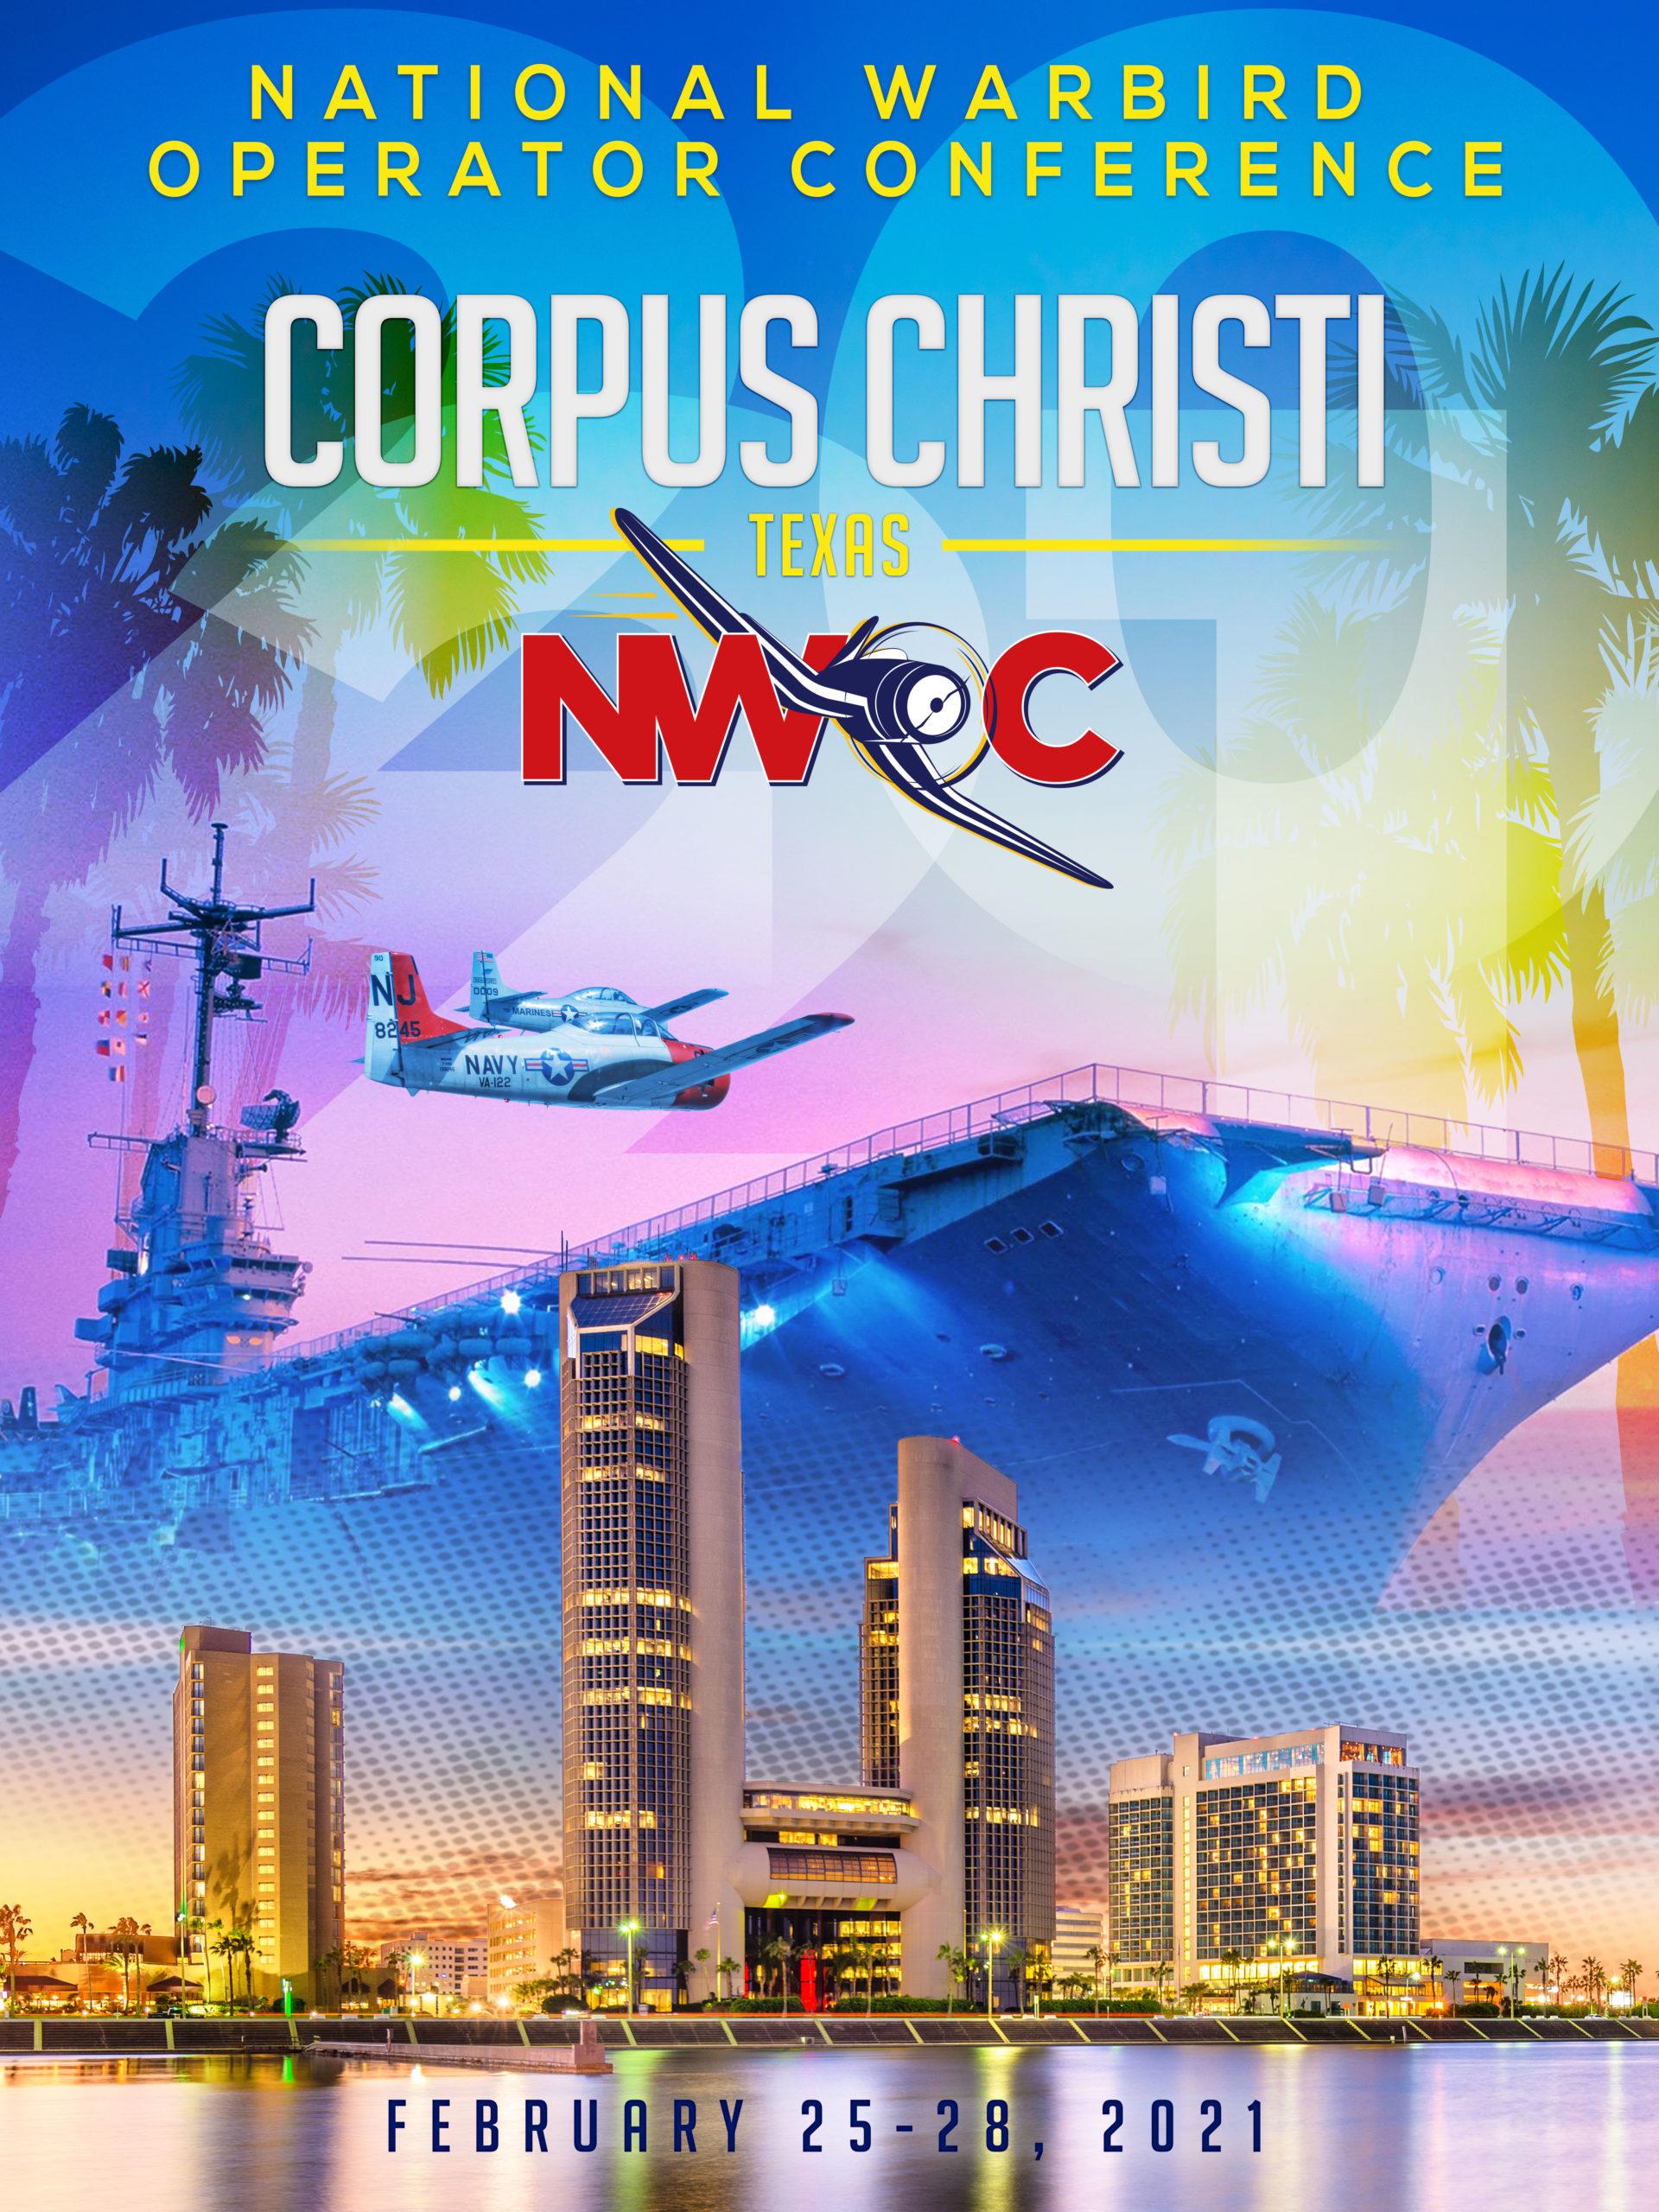 NWOC Corpus Christi 18x24 Poster